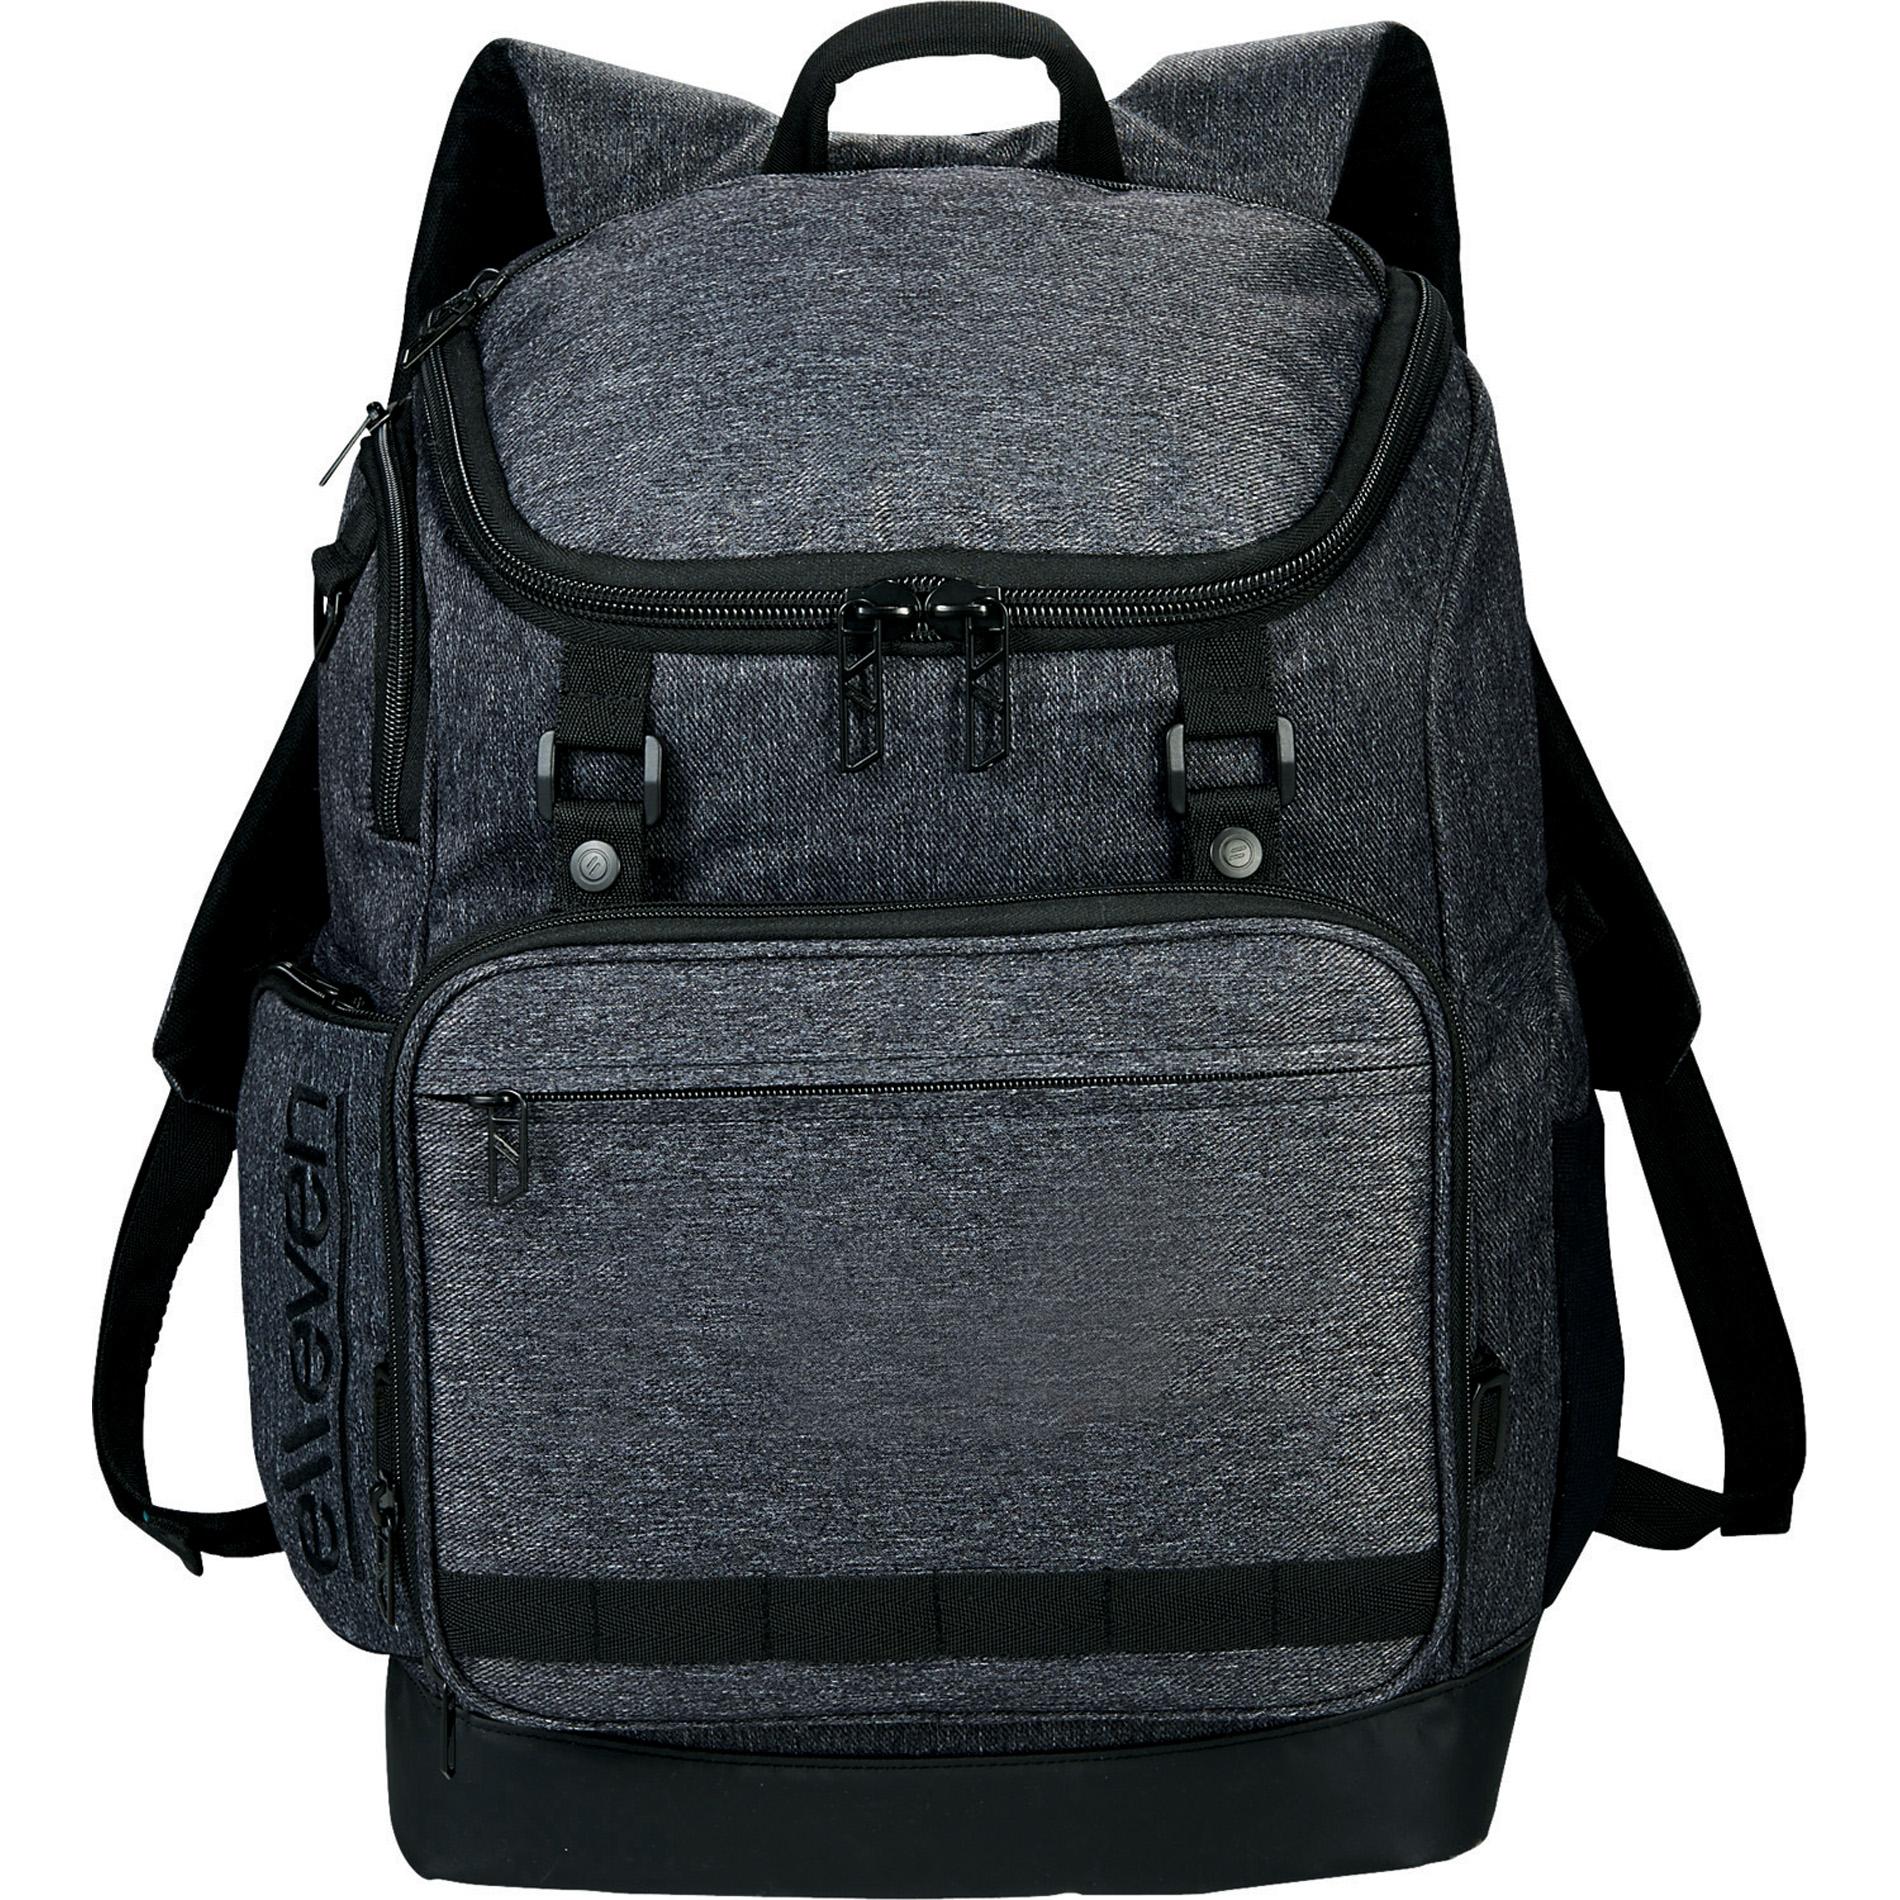 "elleven 0011-62 - Modular 15"" Computer Backpack"